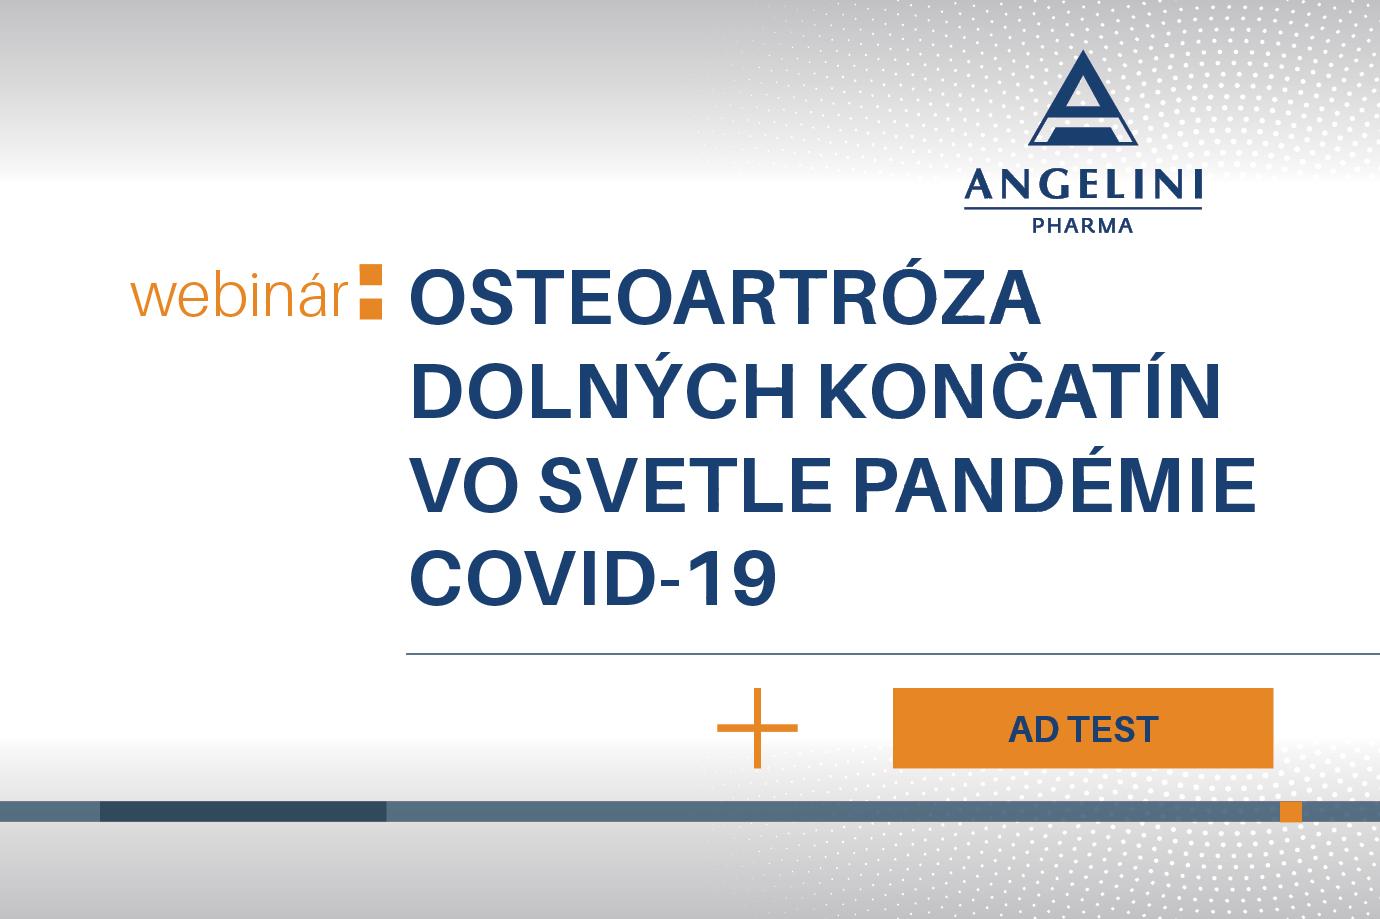 Osteoartróza dolných končatín vo svetle pandémie COVID-19